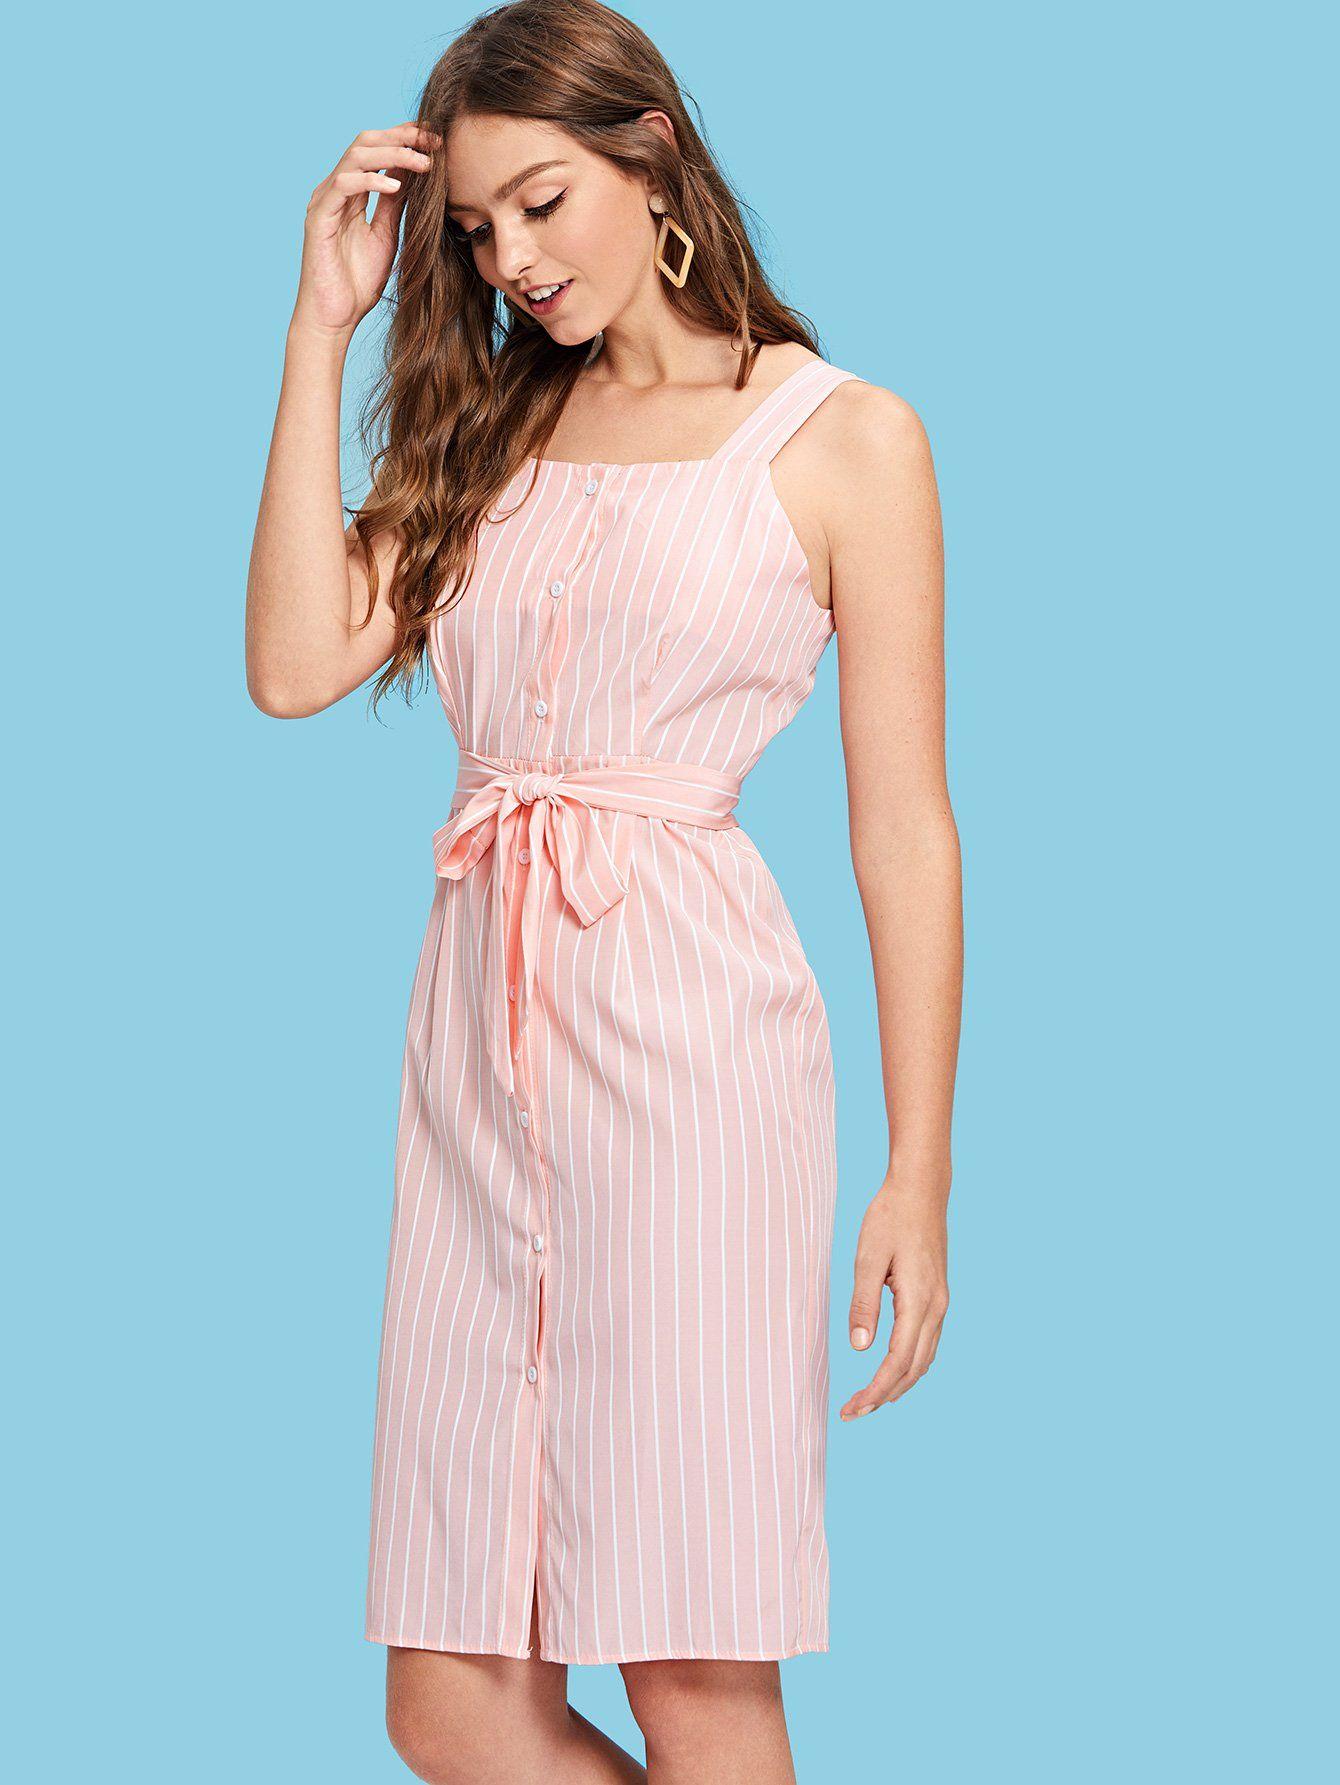 officiel en stock dernière mode Robe à rayures avec ceinture-French SheIn(Sheinside) | robes ...